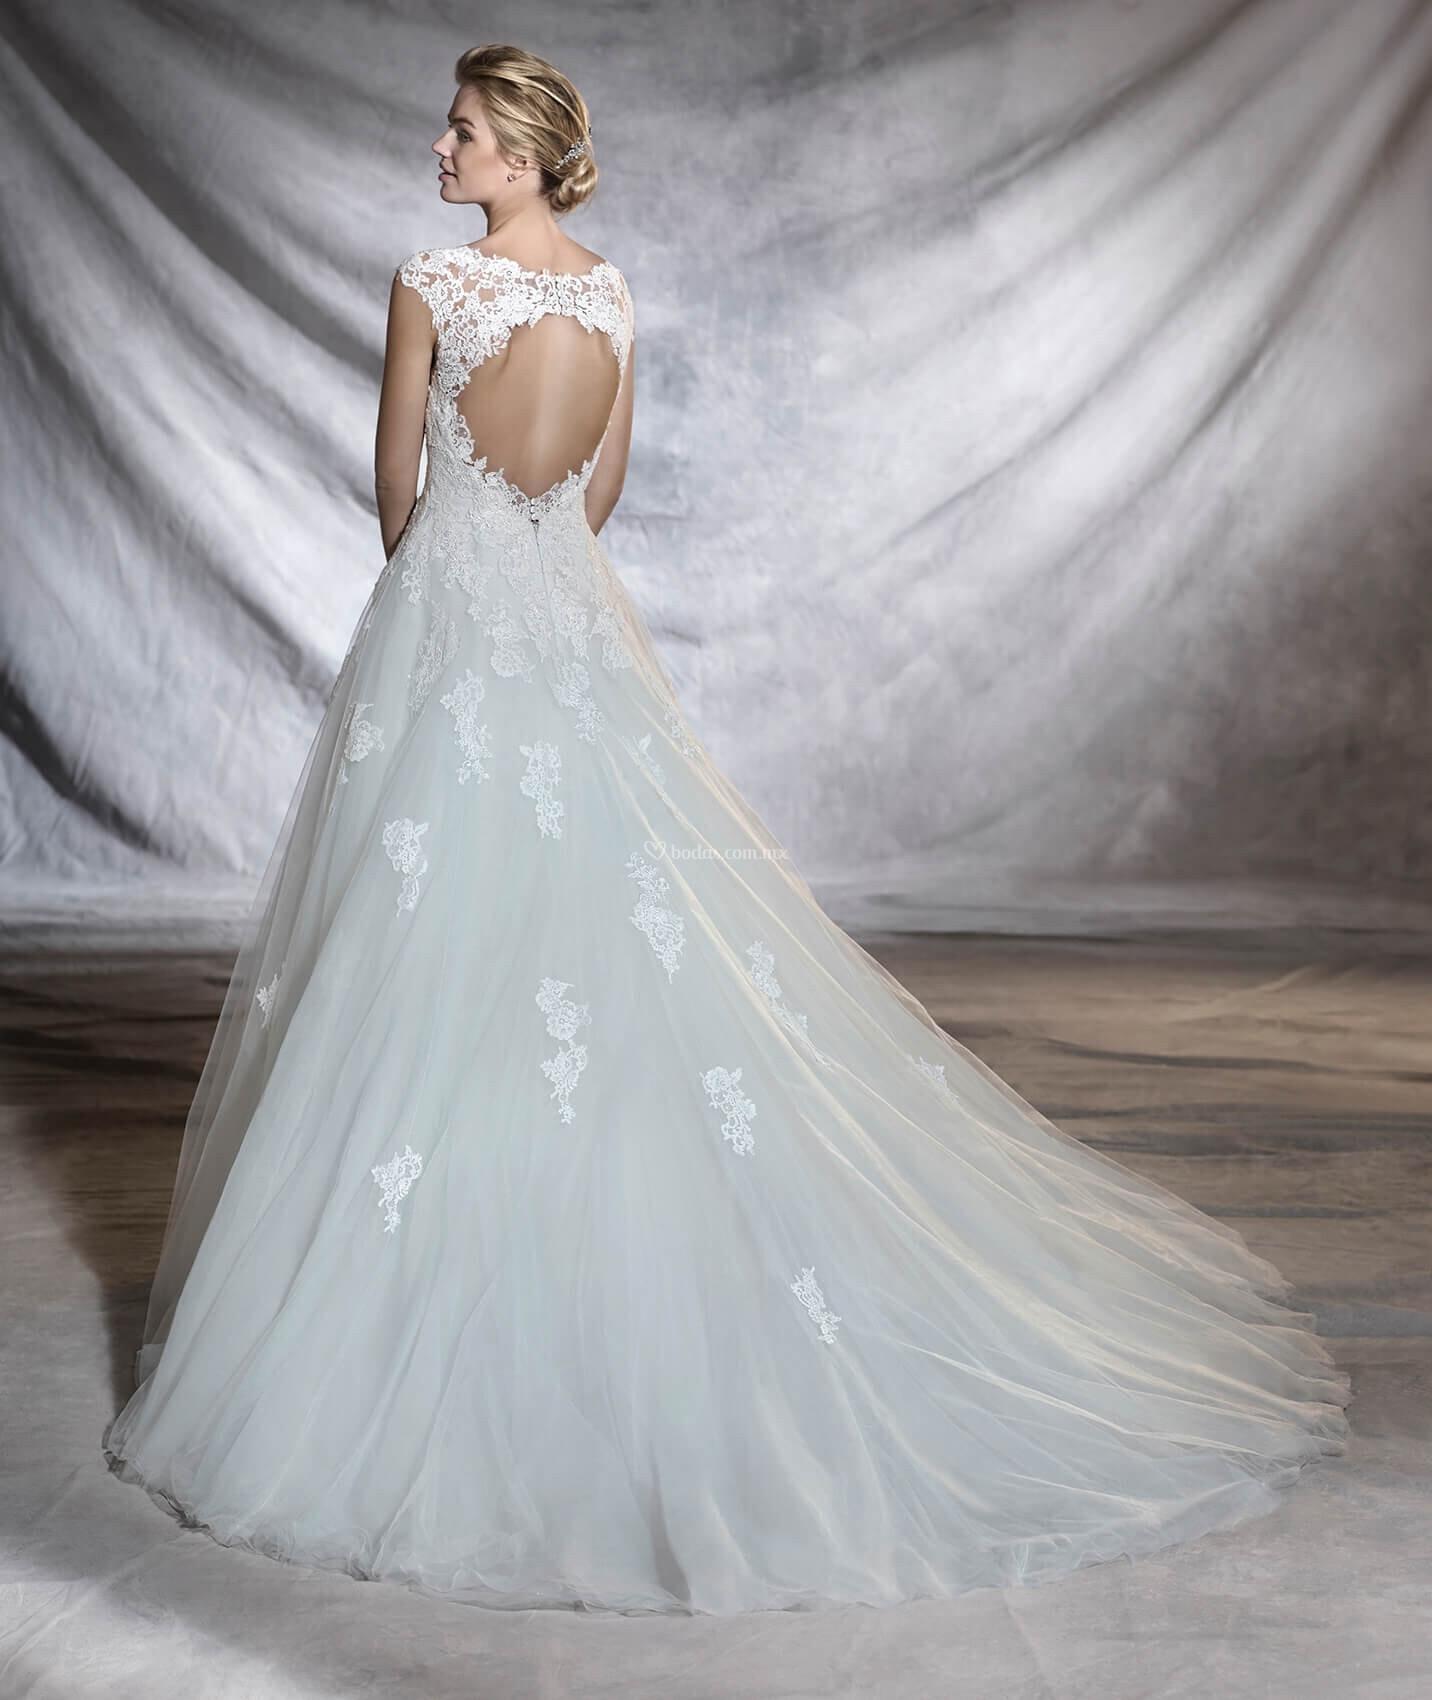 Vestido de Novia de Pronovias - OLEGARIA